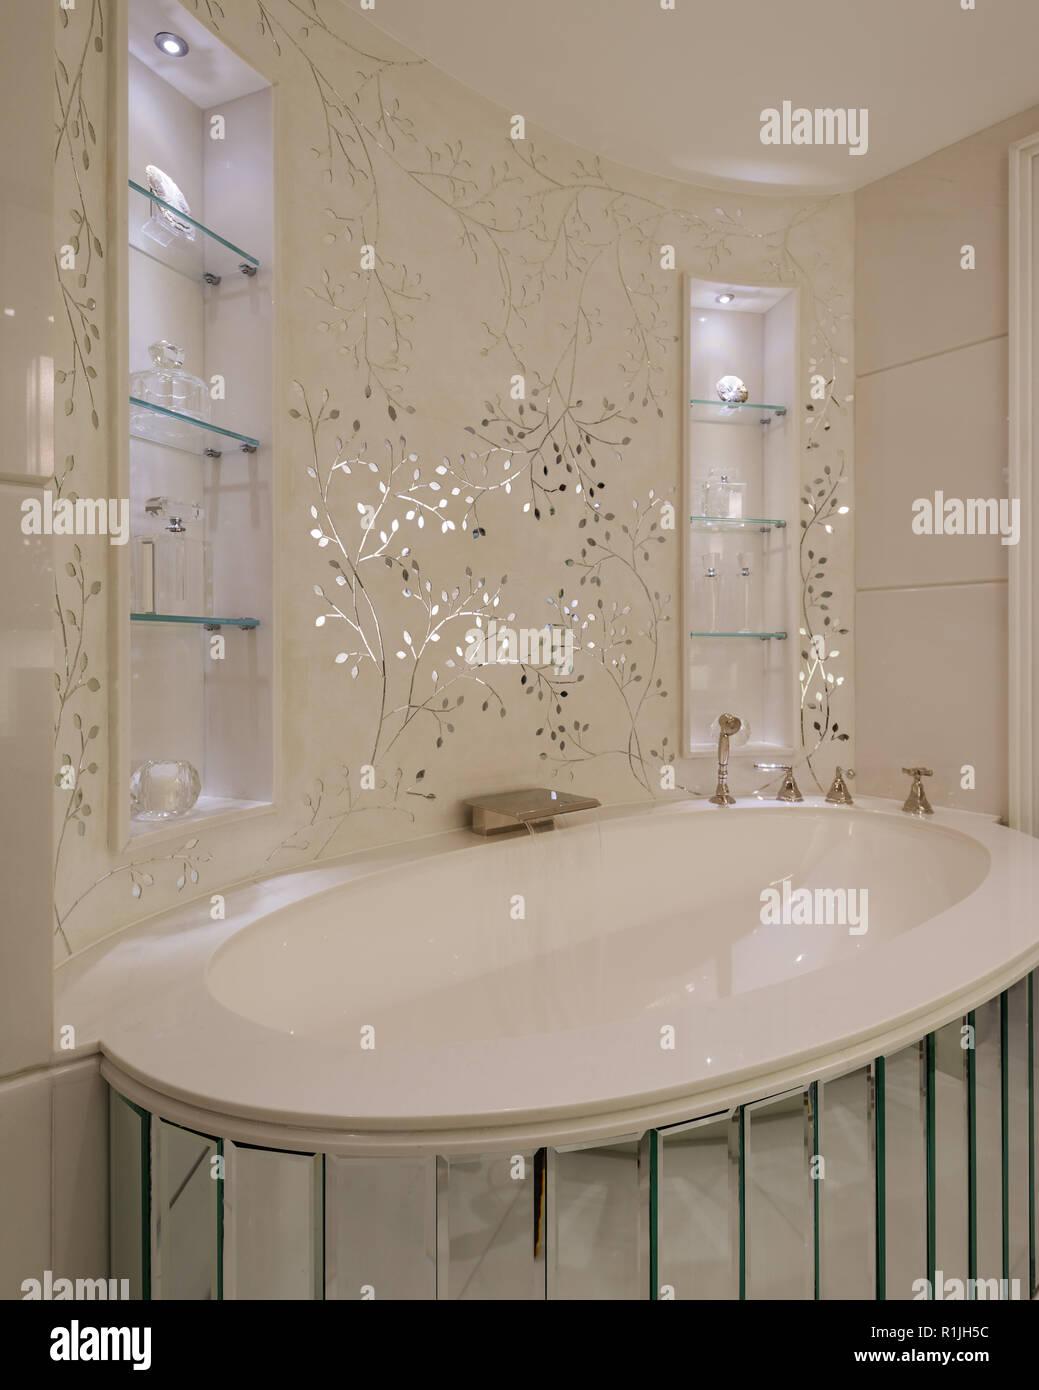 White floral wallpaper over bathtub - Stock Image